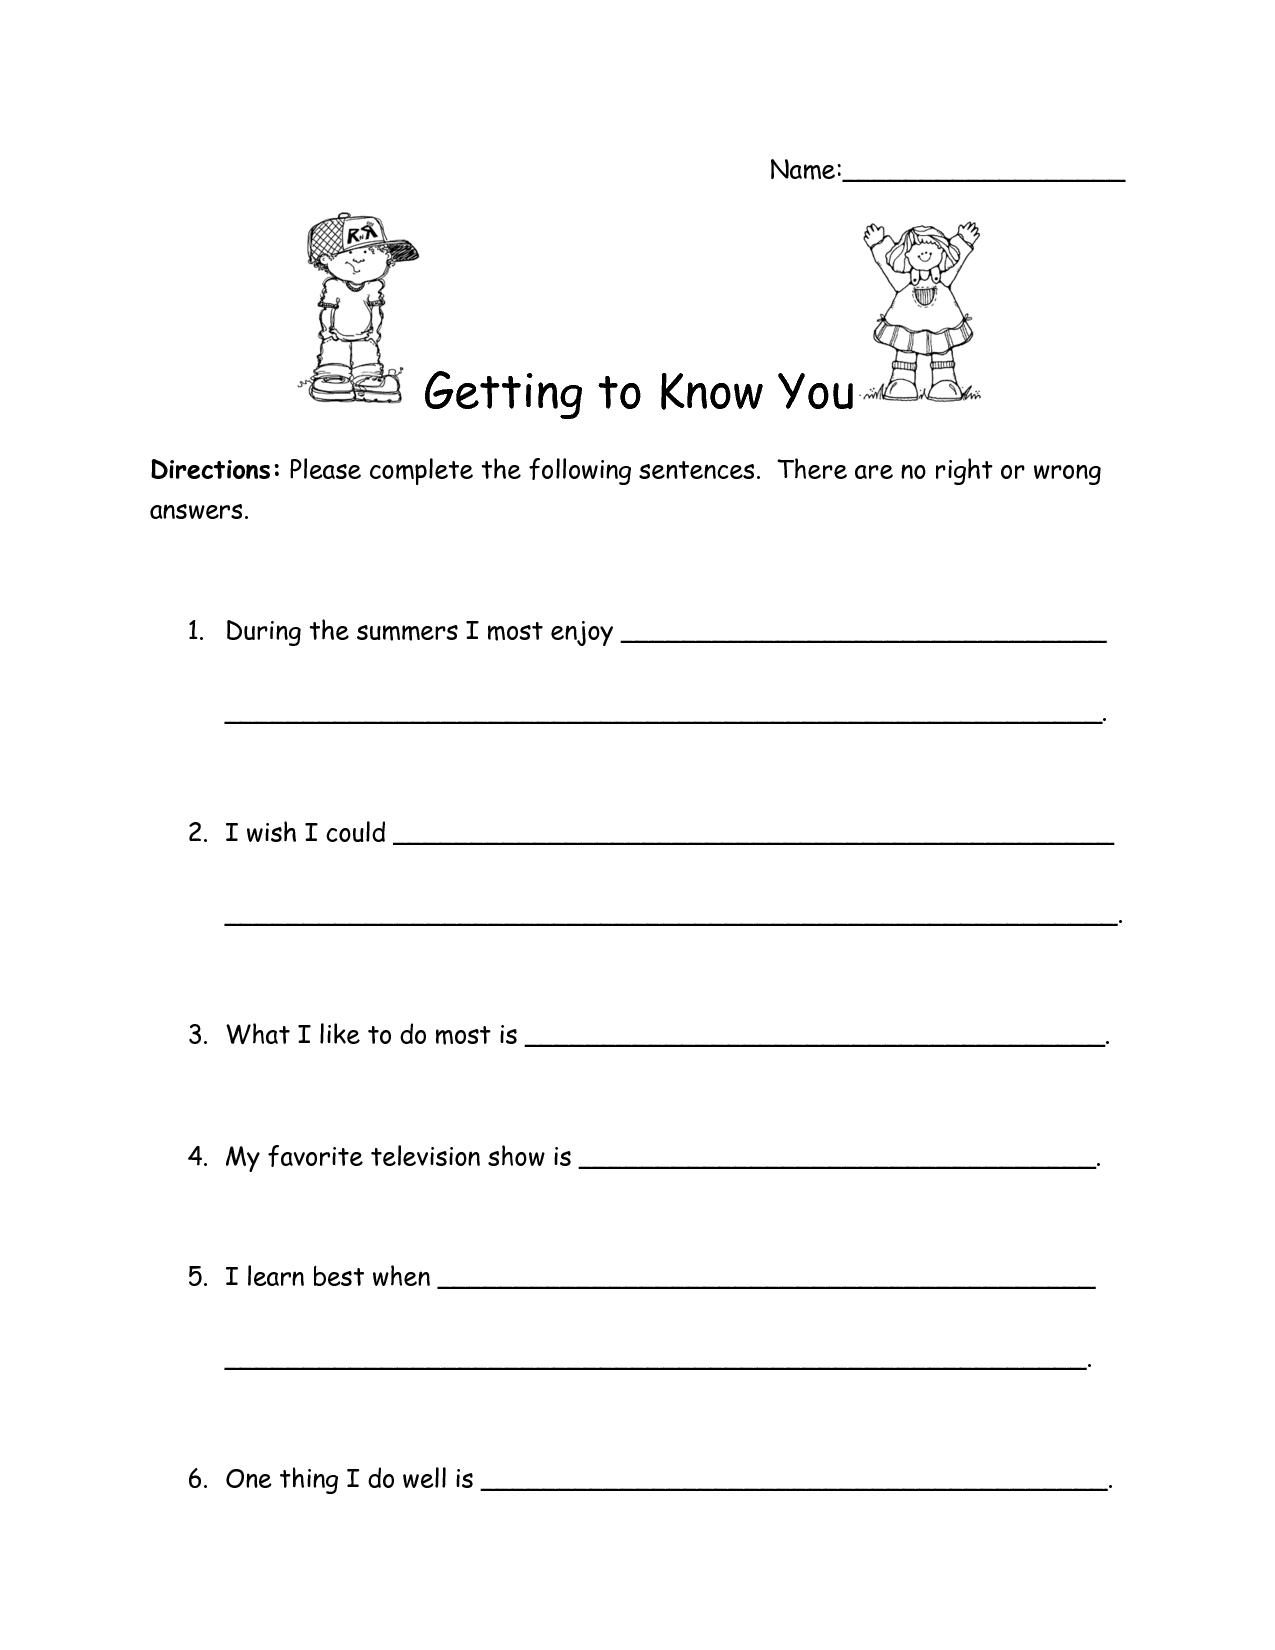 Worksheet Getting To Know You Worksheet Mean Median Mode